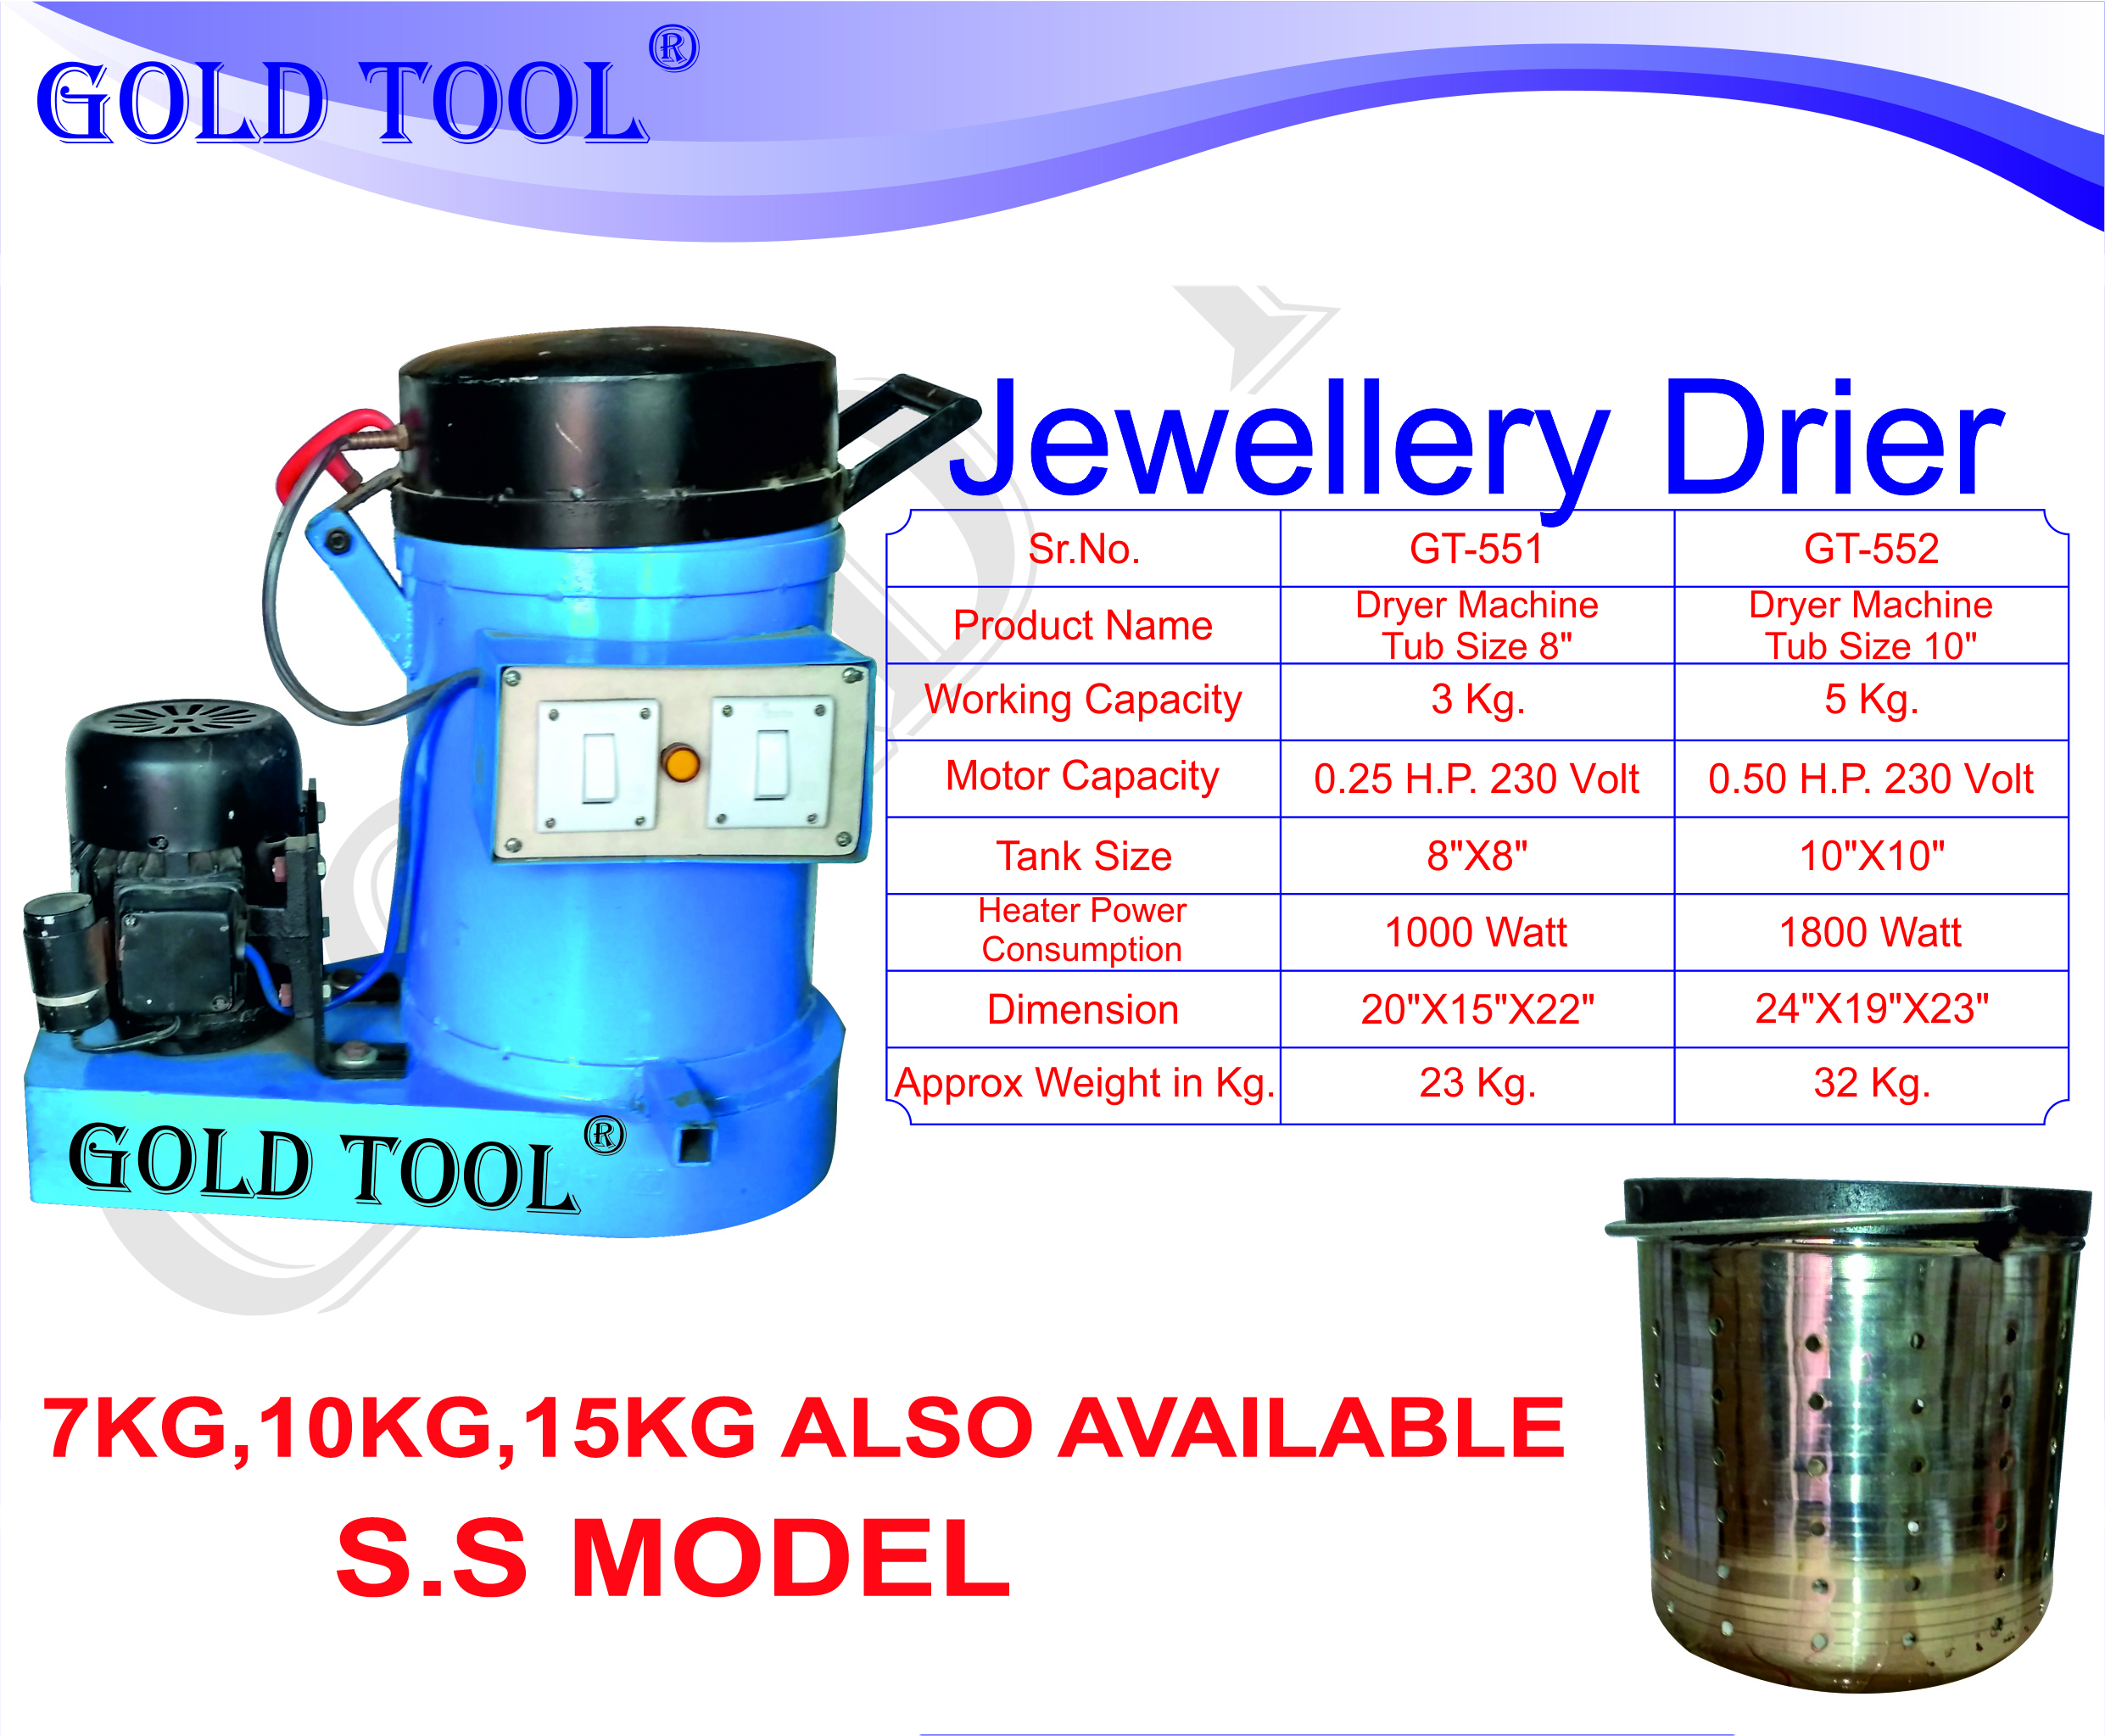 Jewellery Dryer Machine